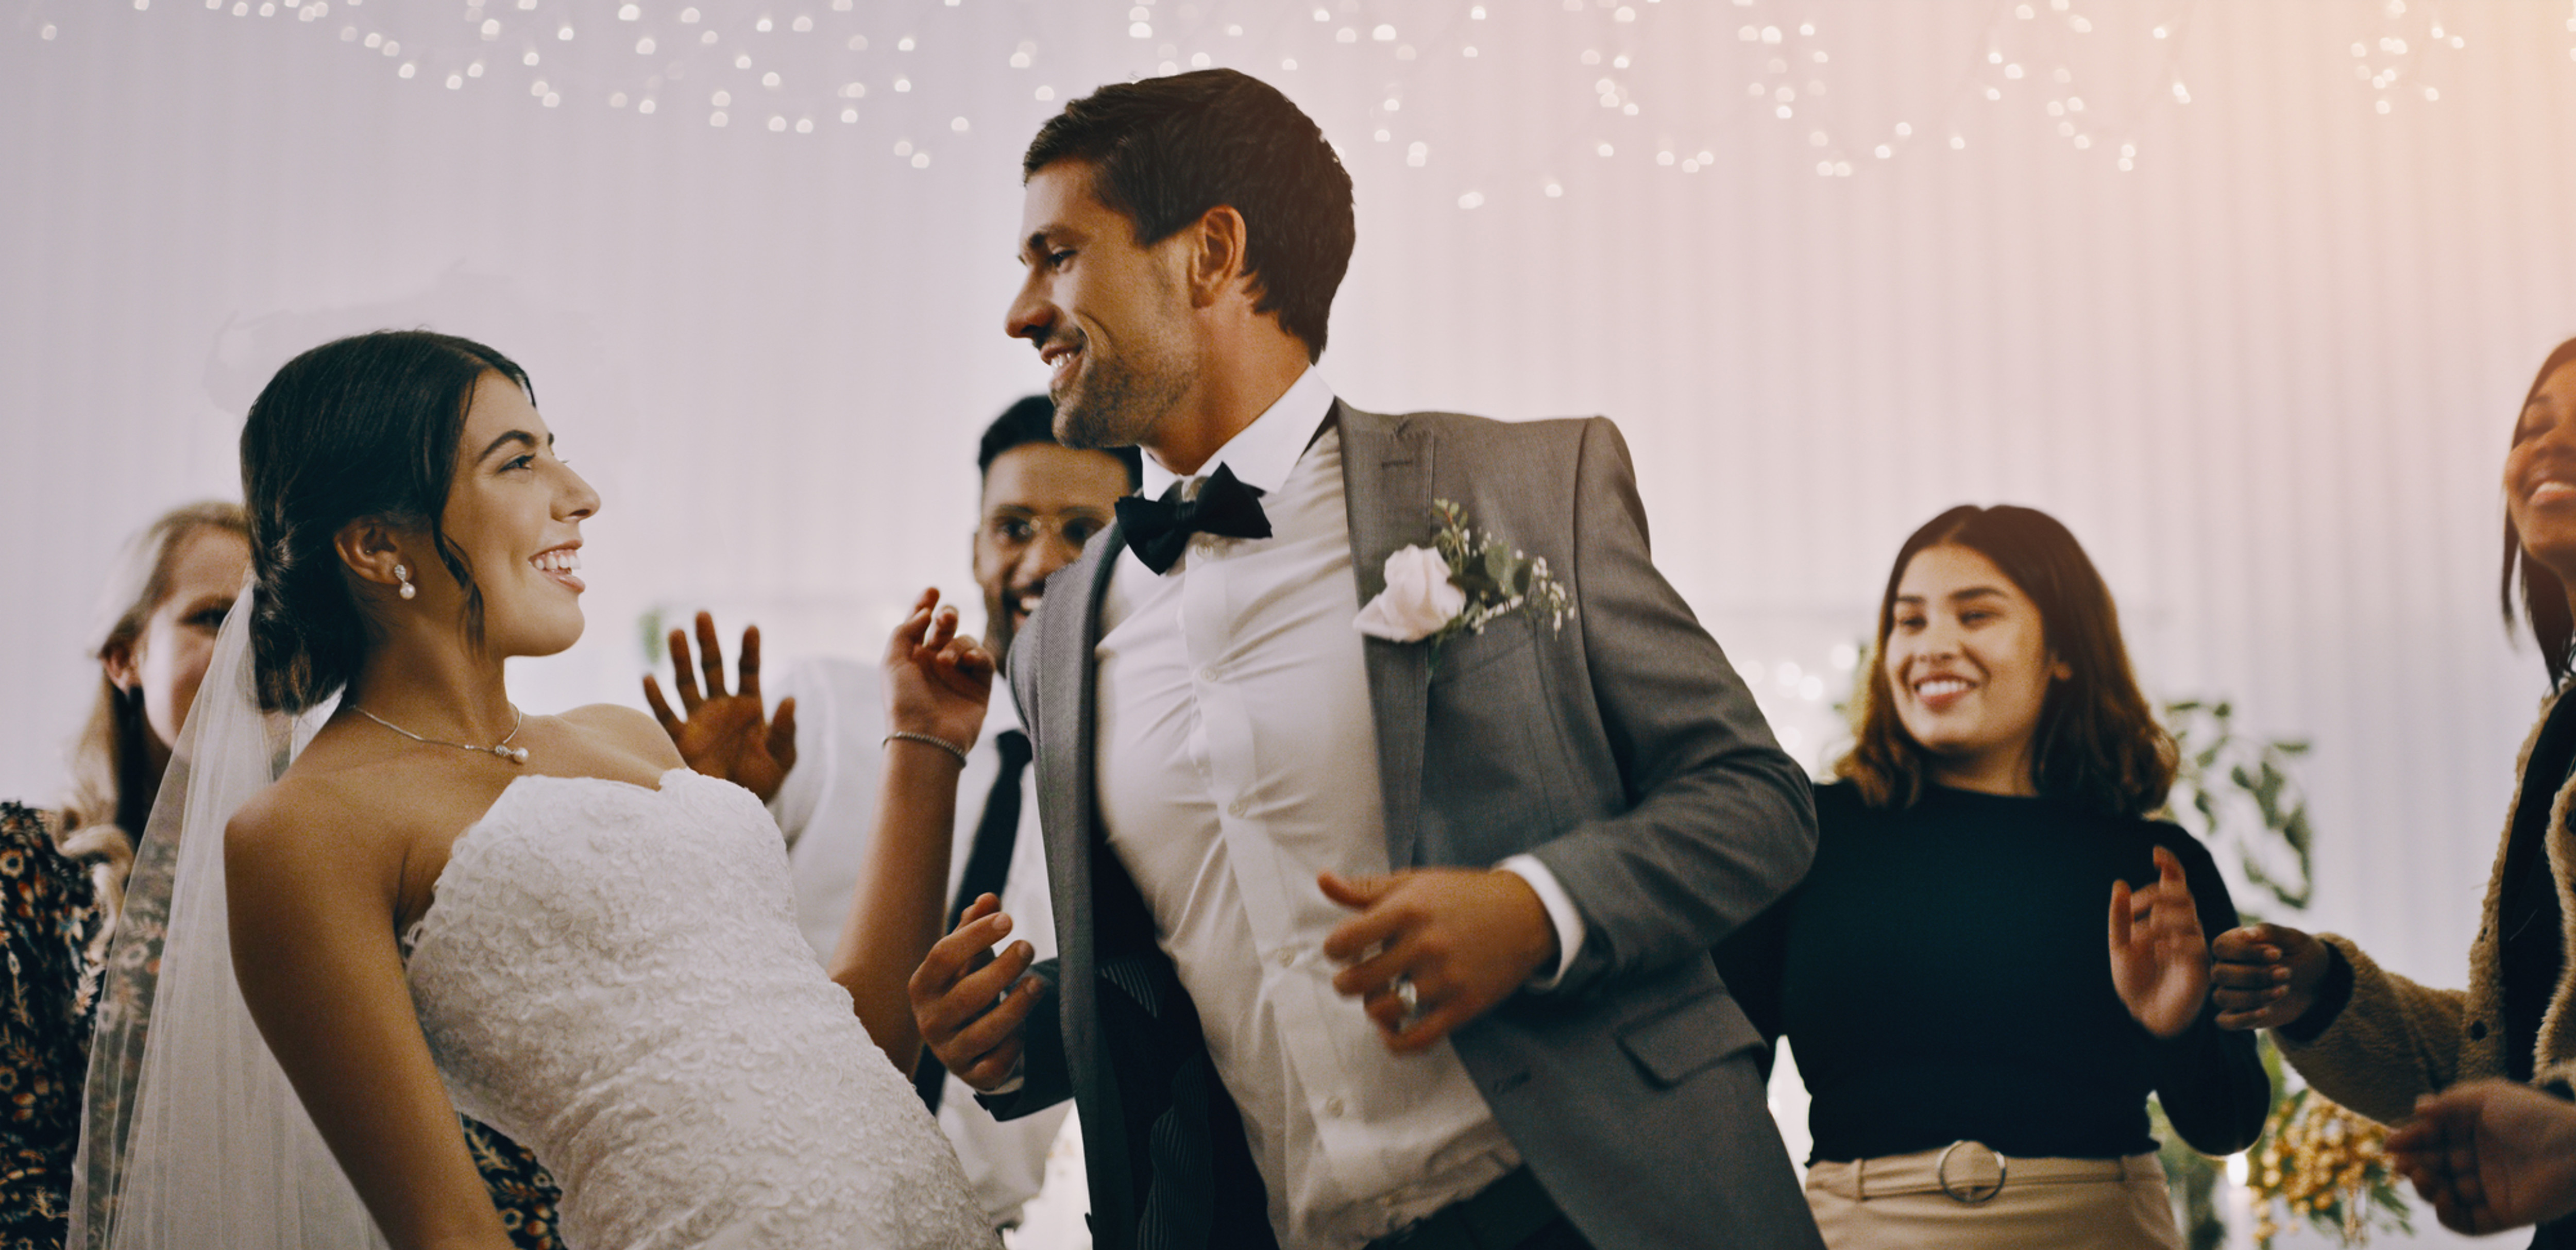 1st Dance - Wedding couples